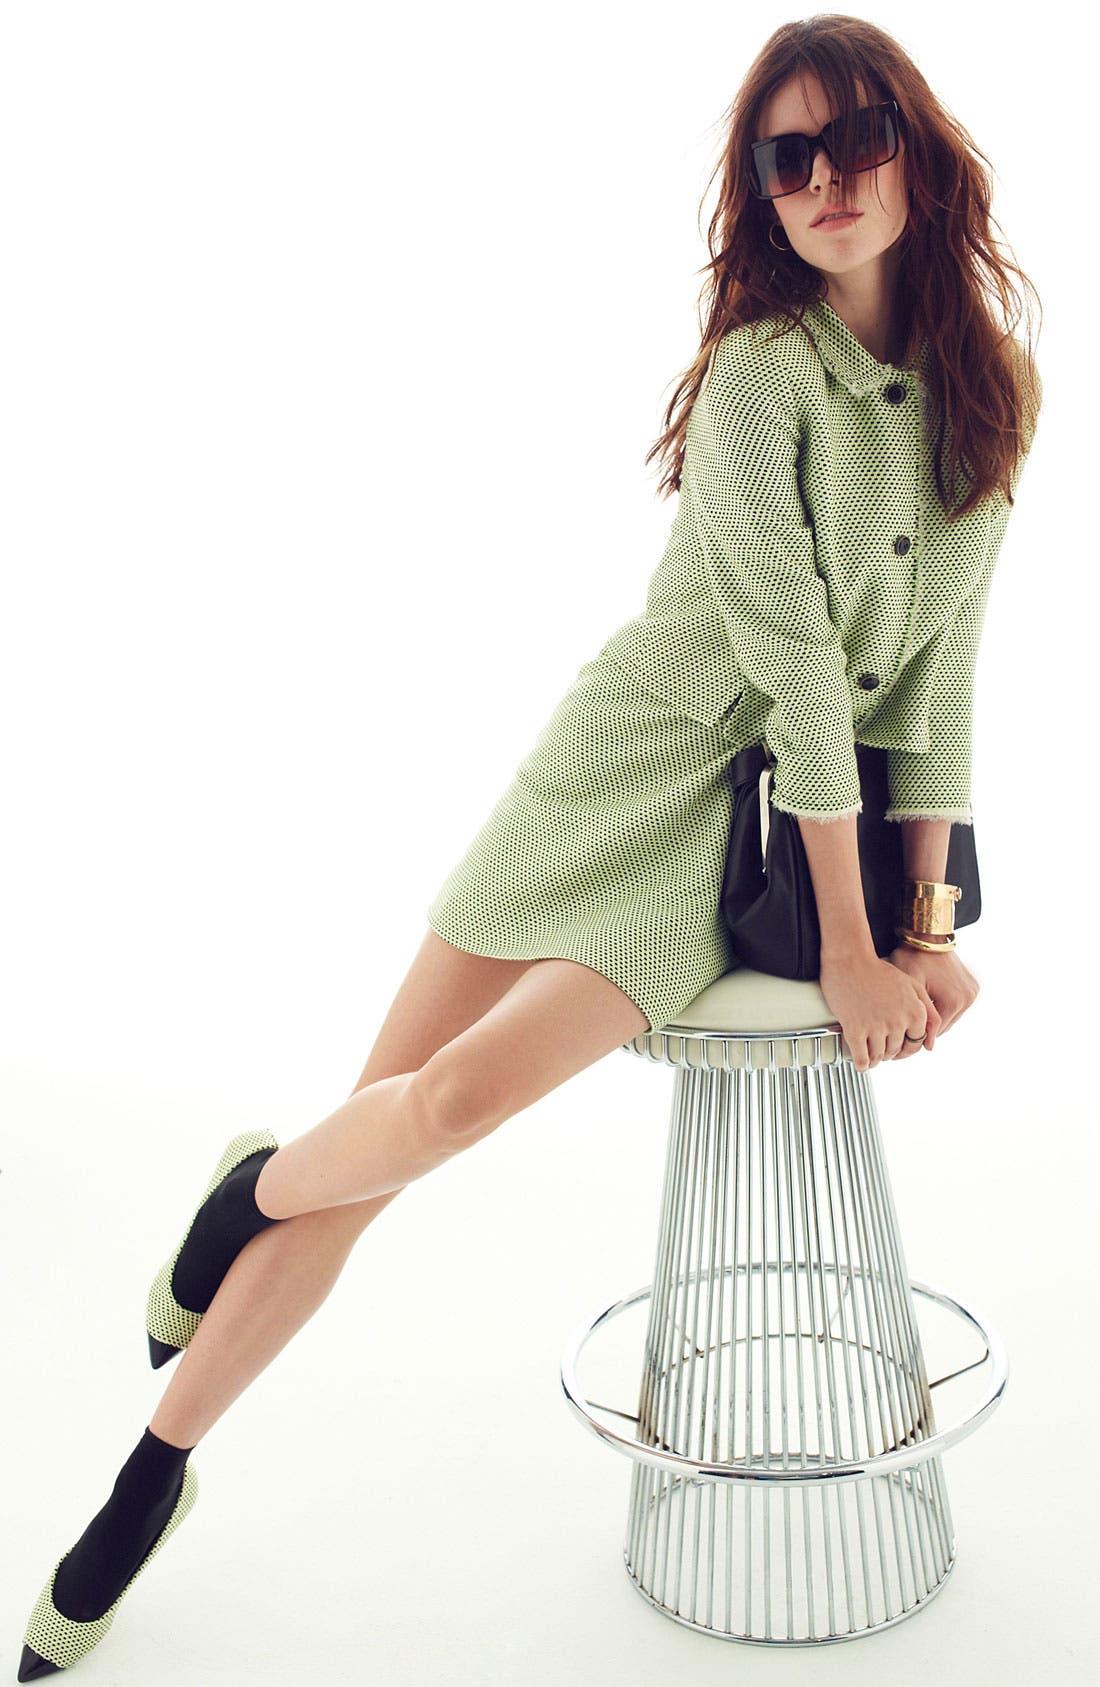 Alternate Image 1 Selected - Miss Wu Modern Weave Jacket & Dress (Nordstrom Exclusive)